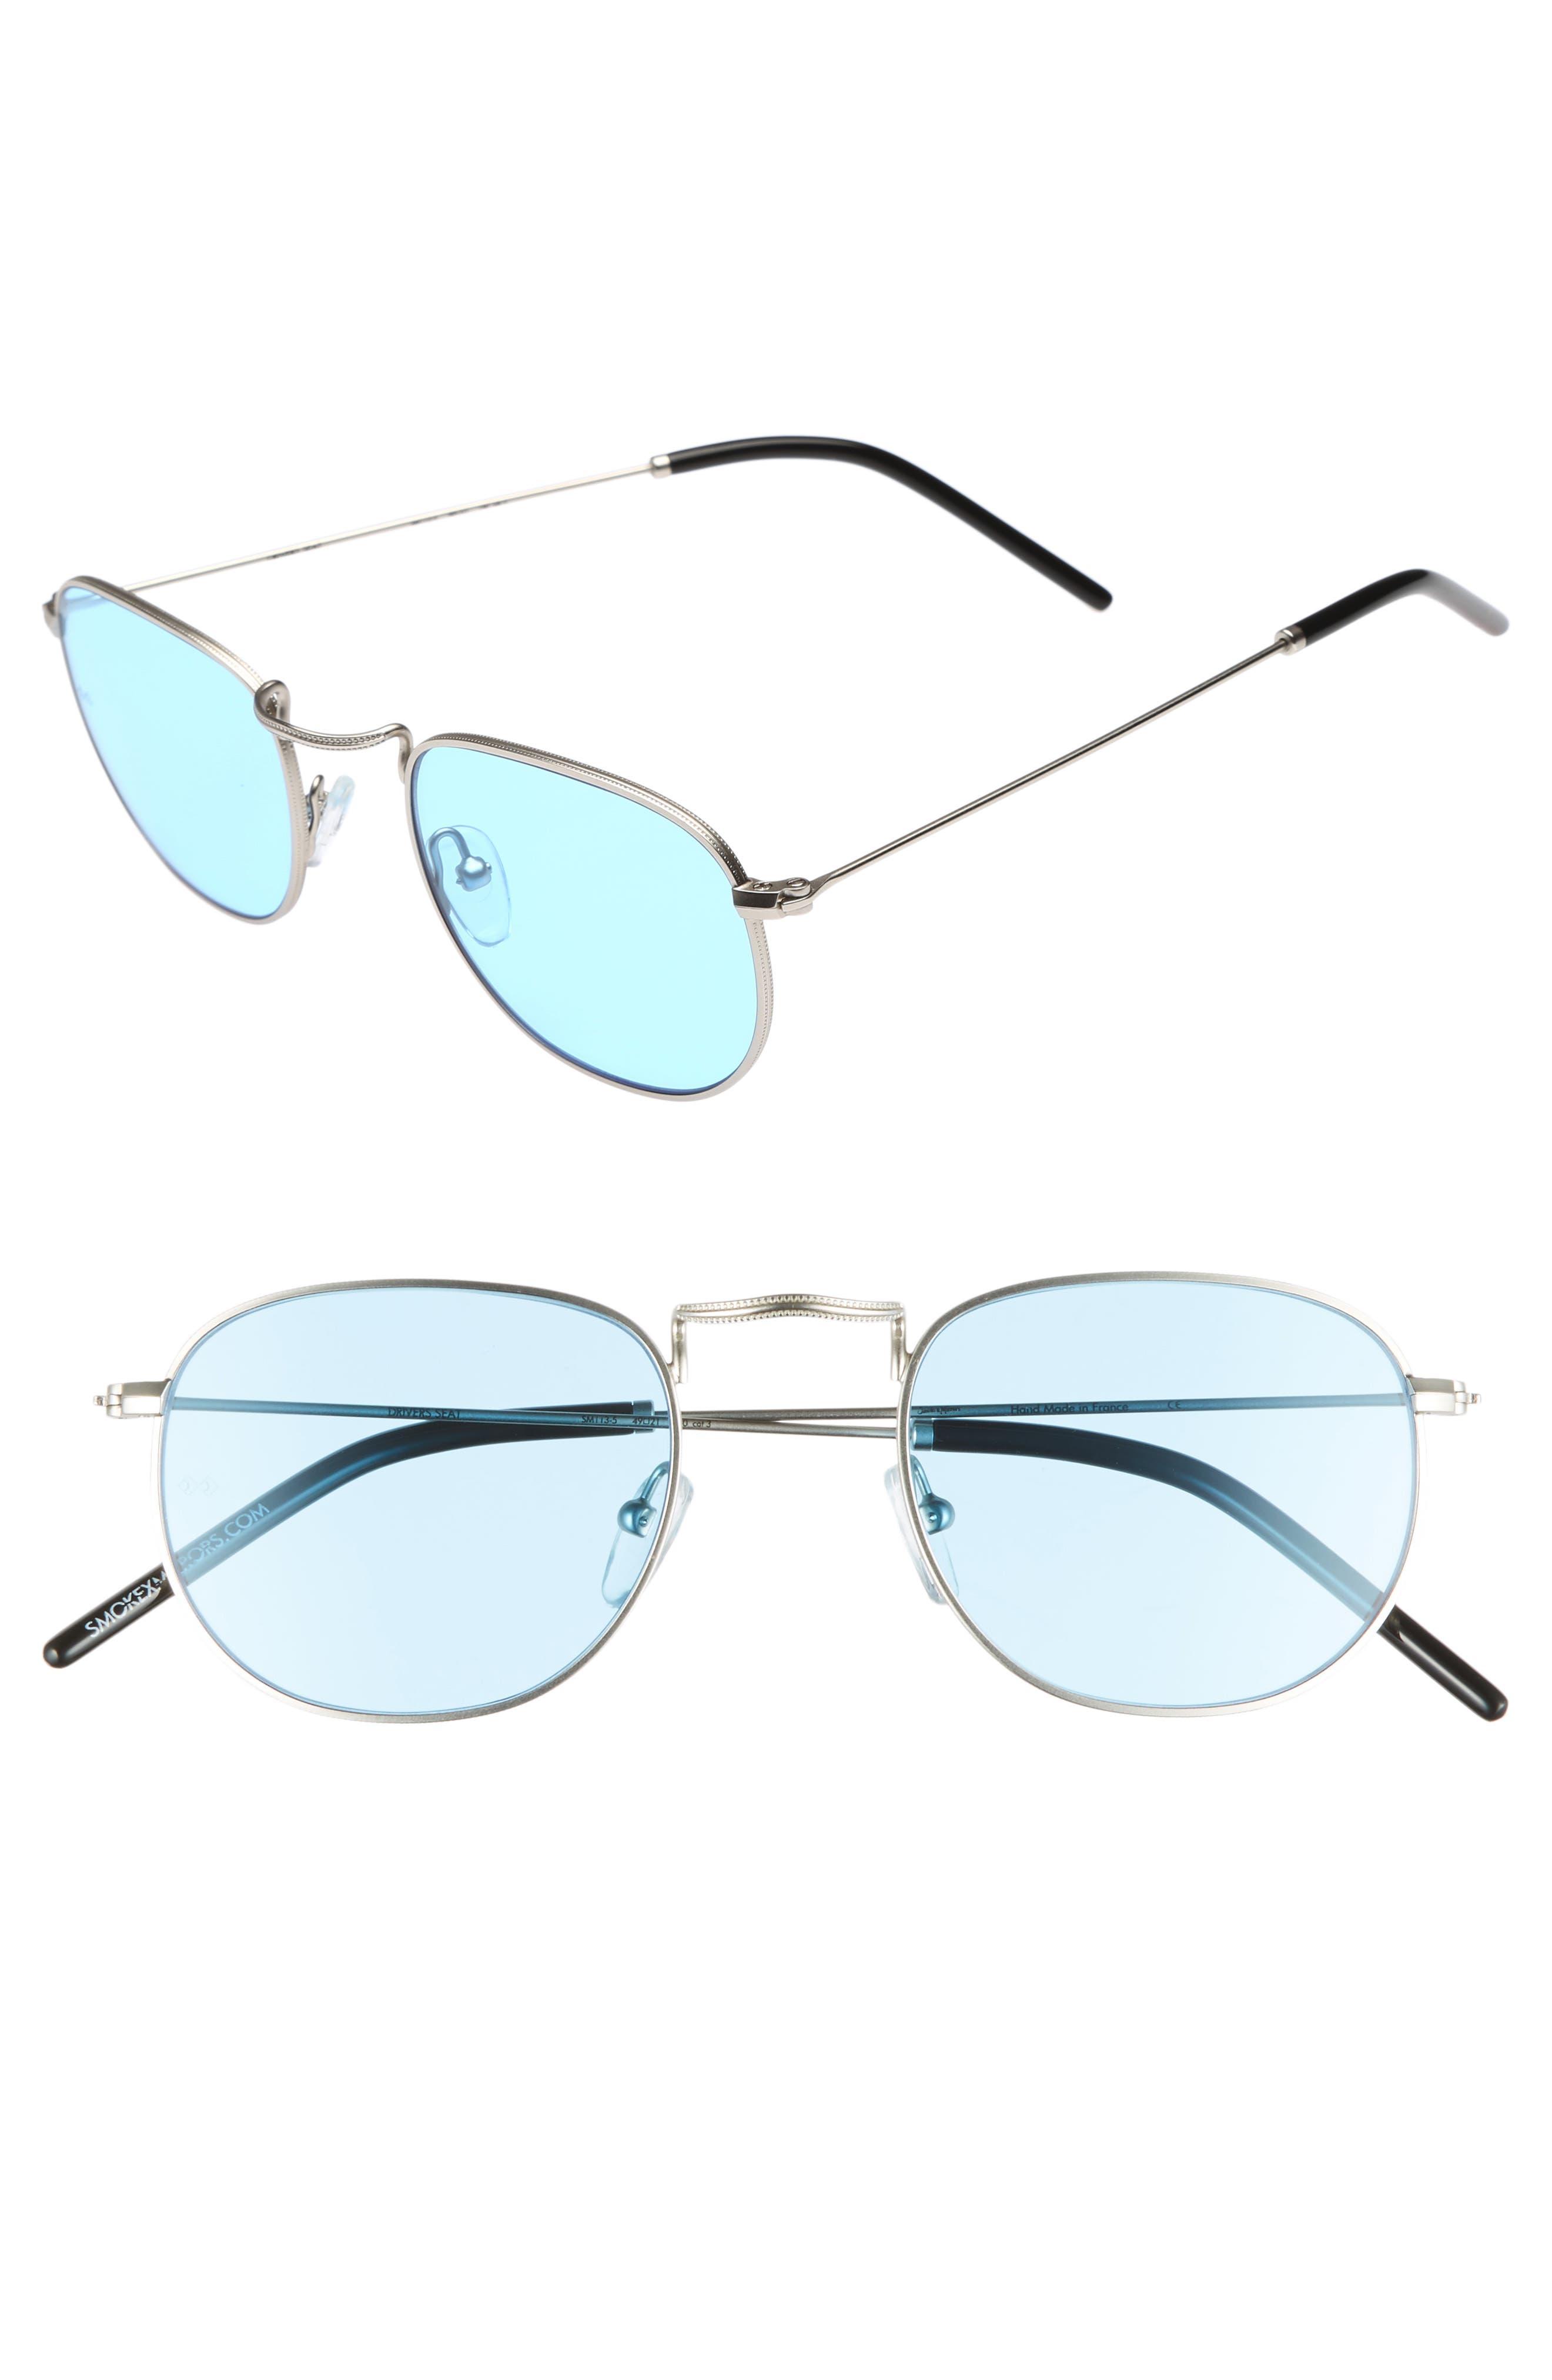 Driver's Seat 49mm Sunglasses,                             Main thumbnail 1, color,                             SILVER/ TRANSPARENT BLUE